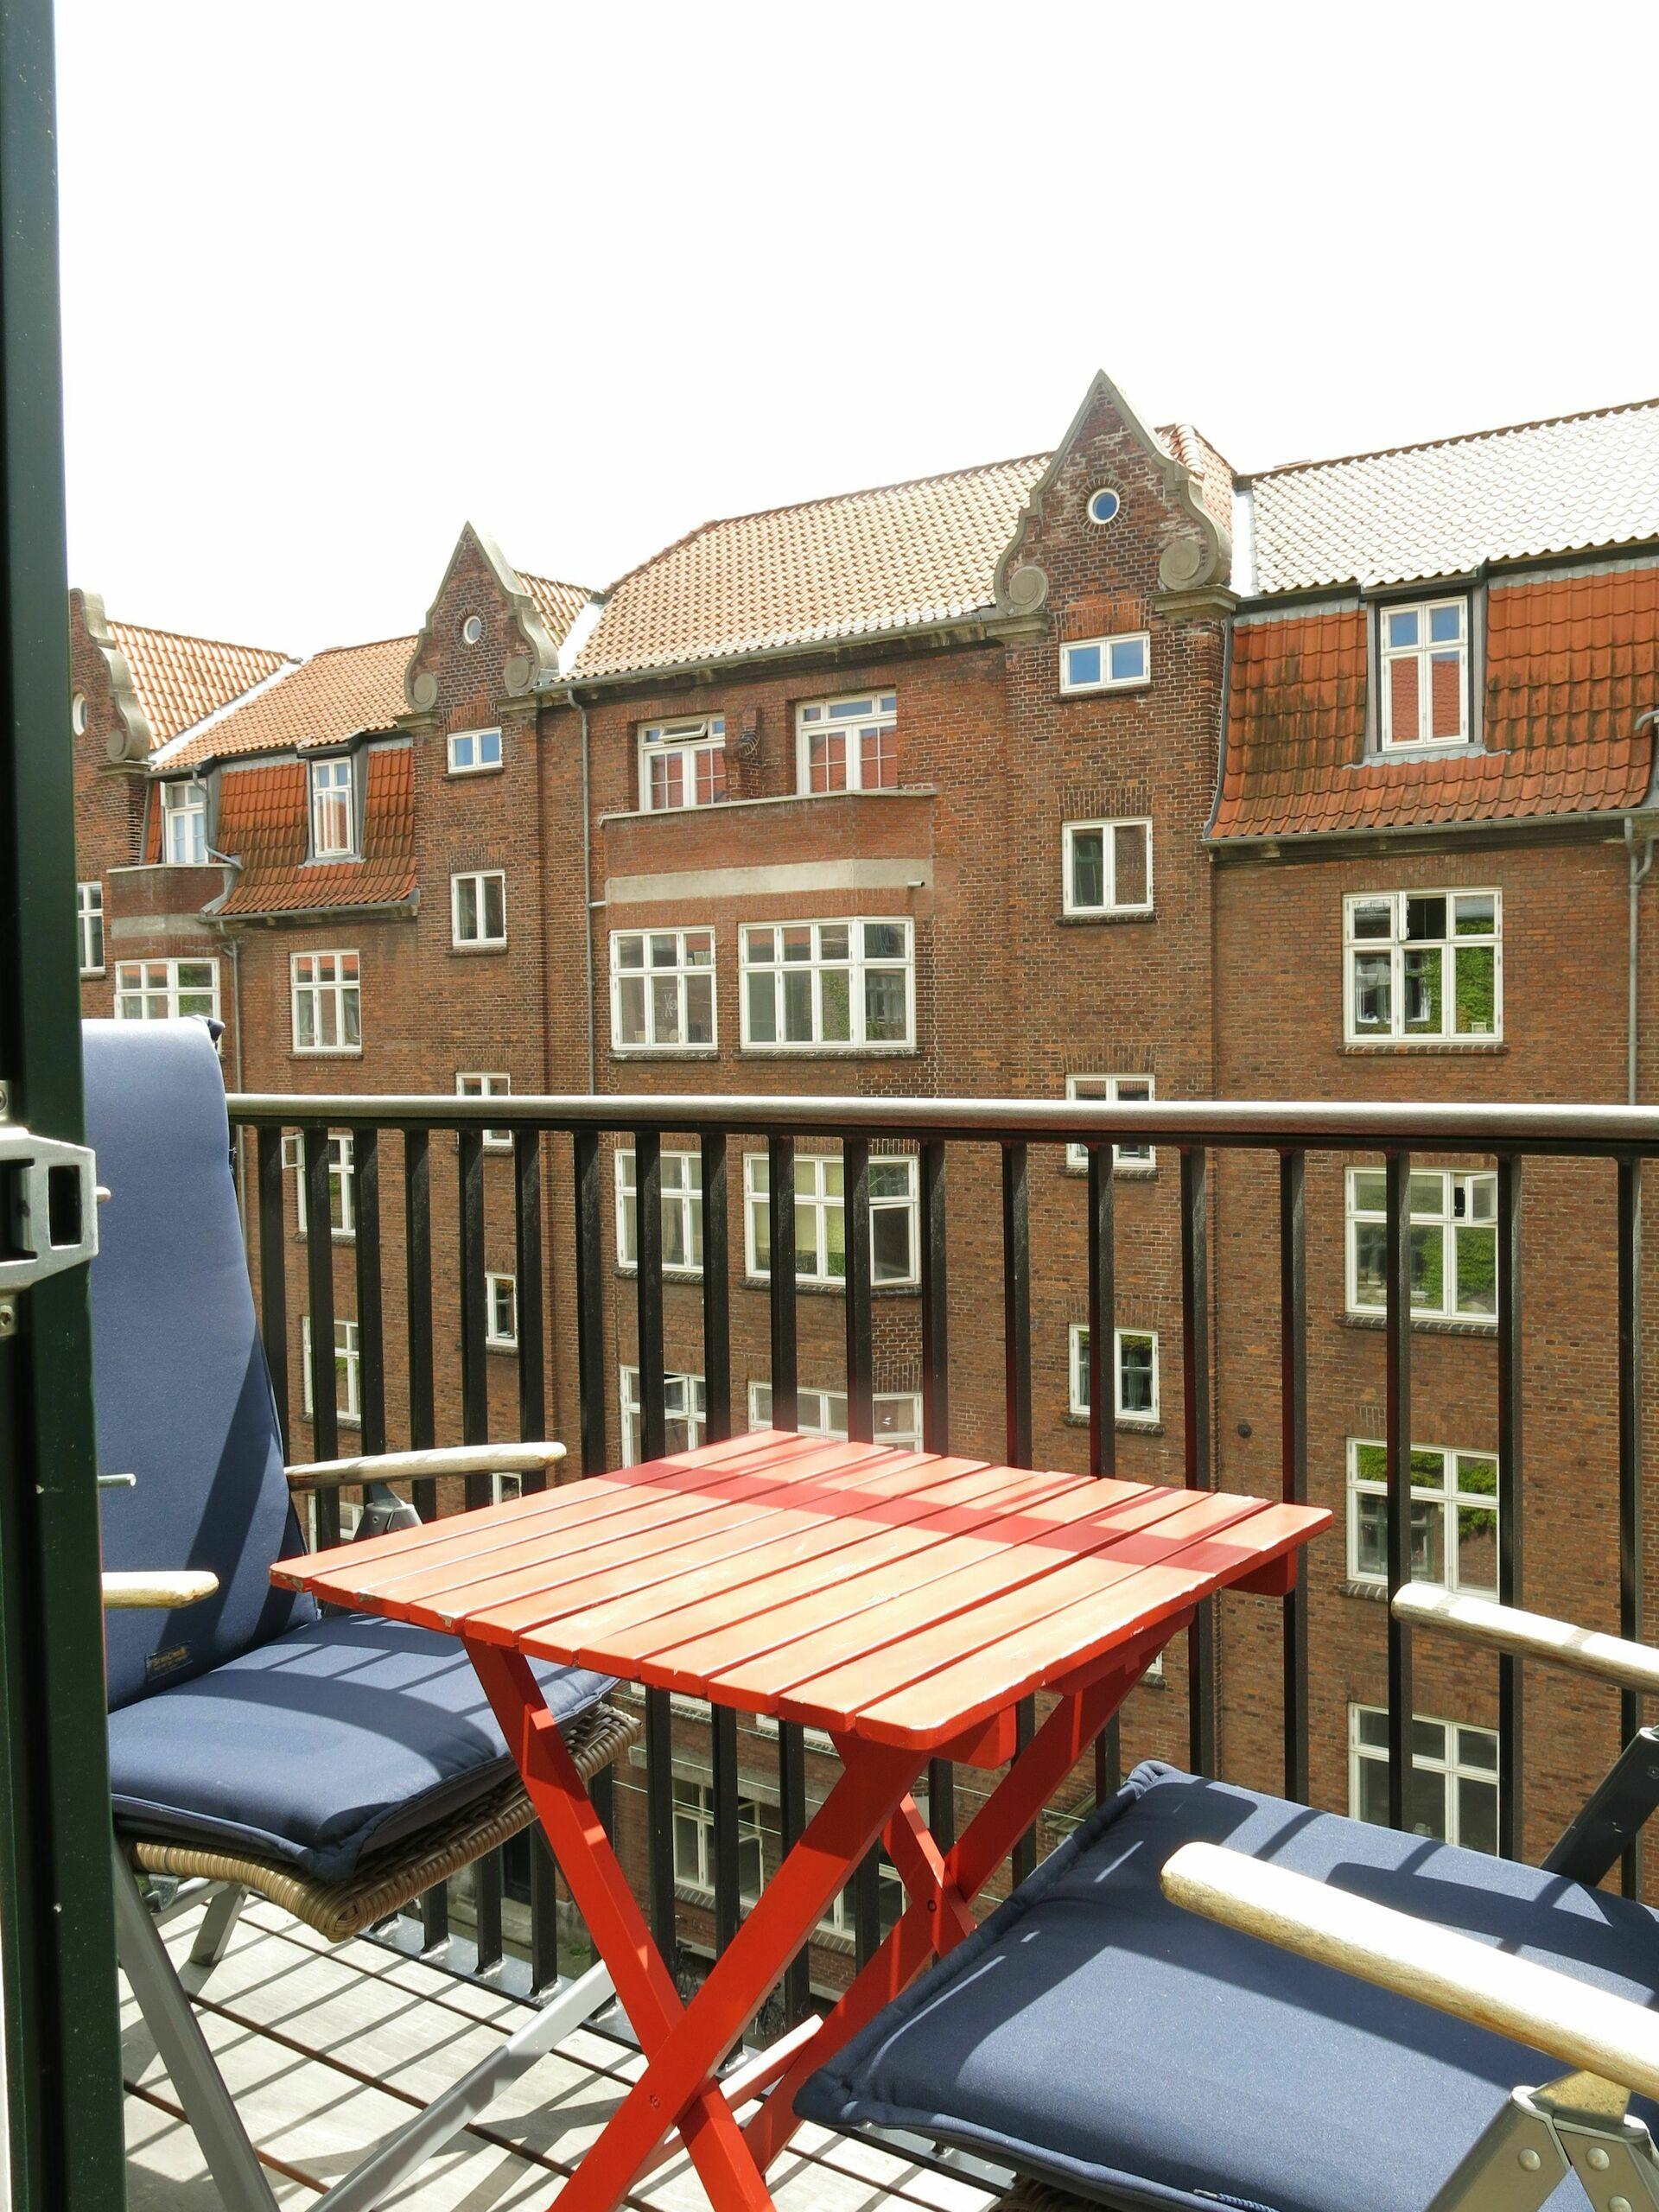 Kopenhagen Wohnung bergthorasgade with balcony wohnung in kopenhagen